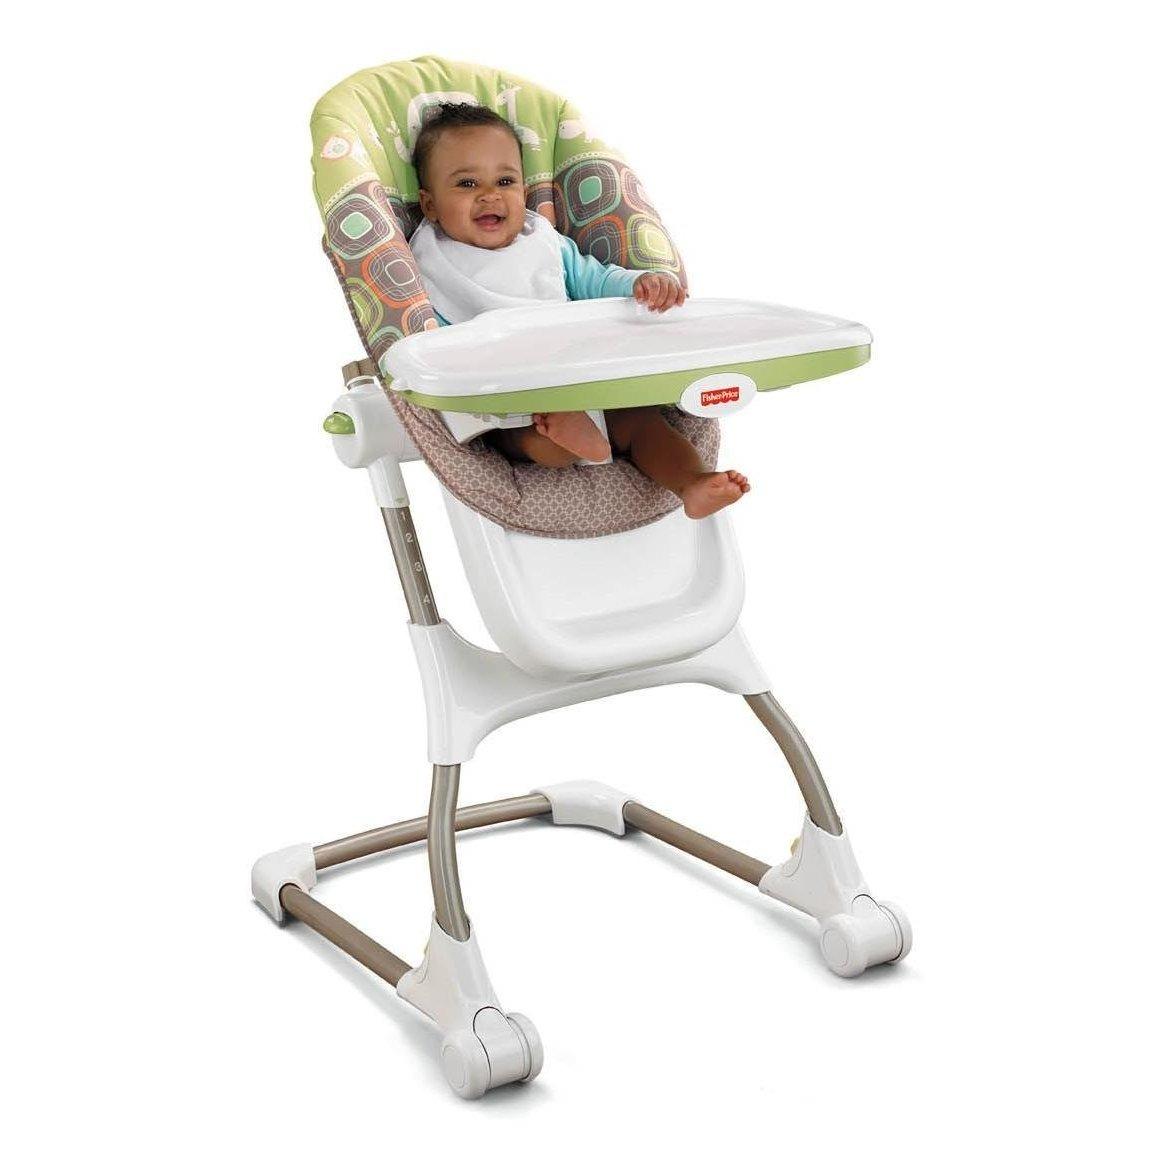 Sillas para beb s imagui - Silla de mesa para bebe ...